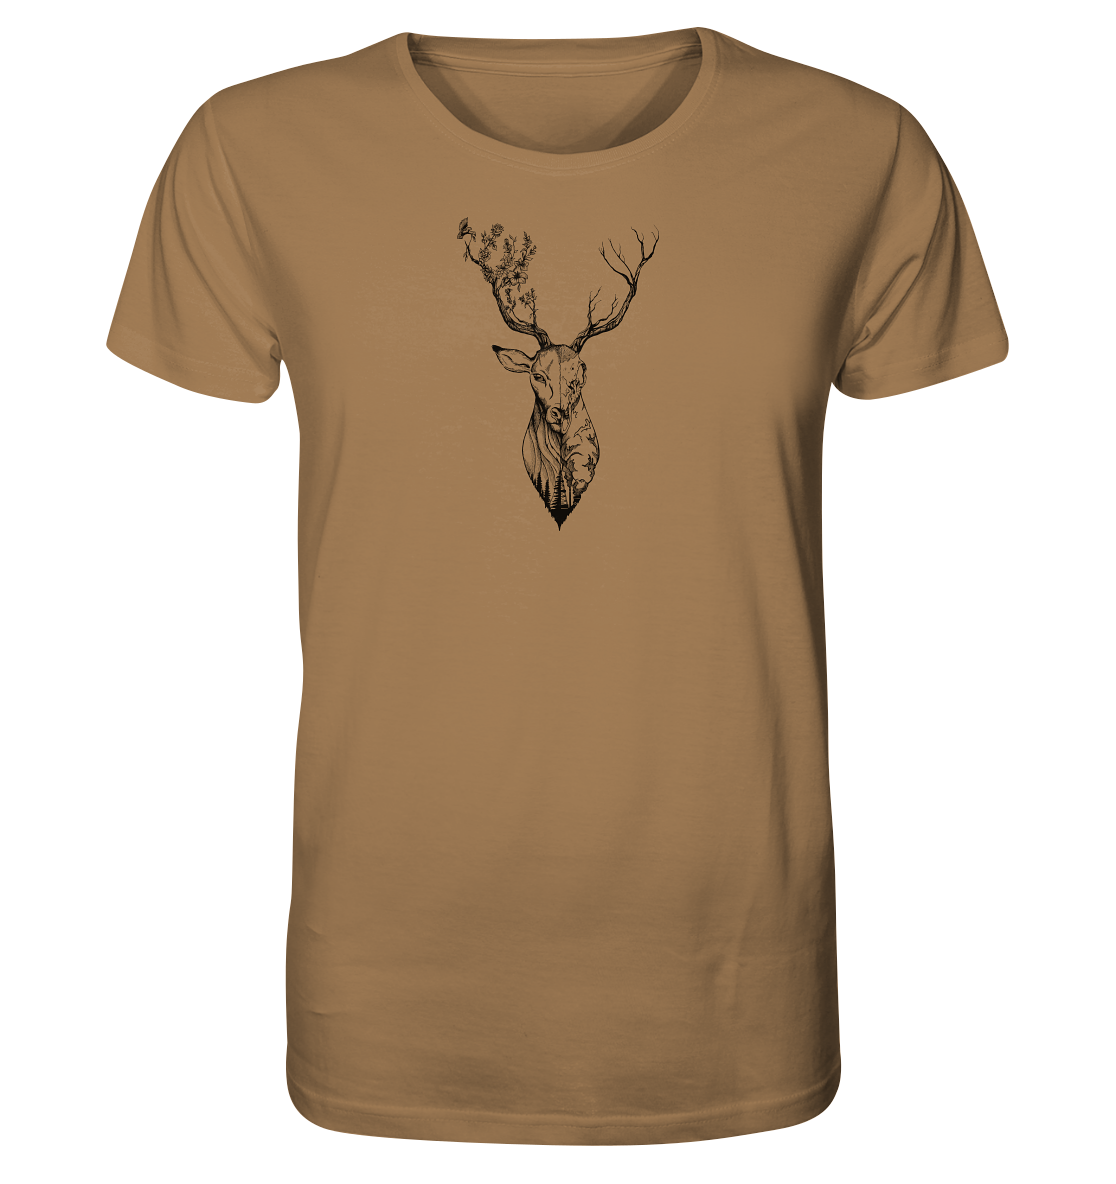 front-organic-shirt-a17c55-1116x-14.png